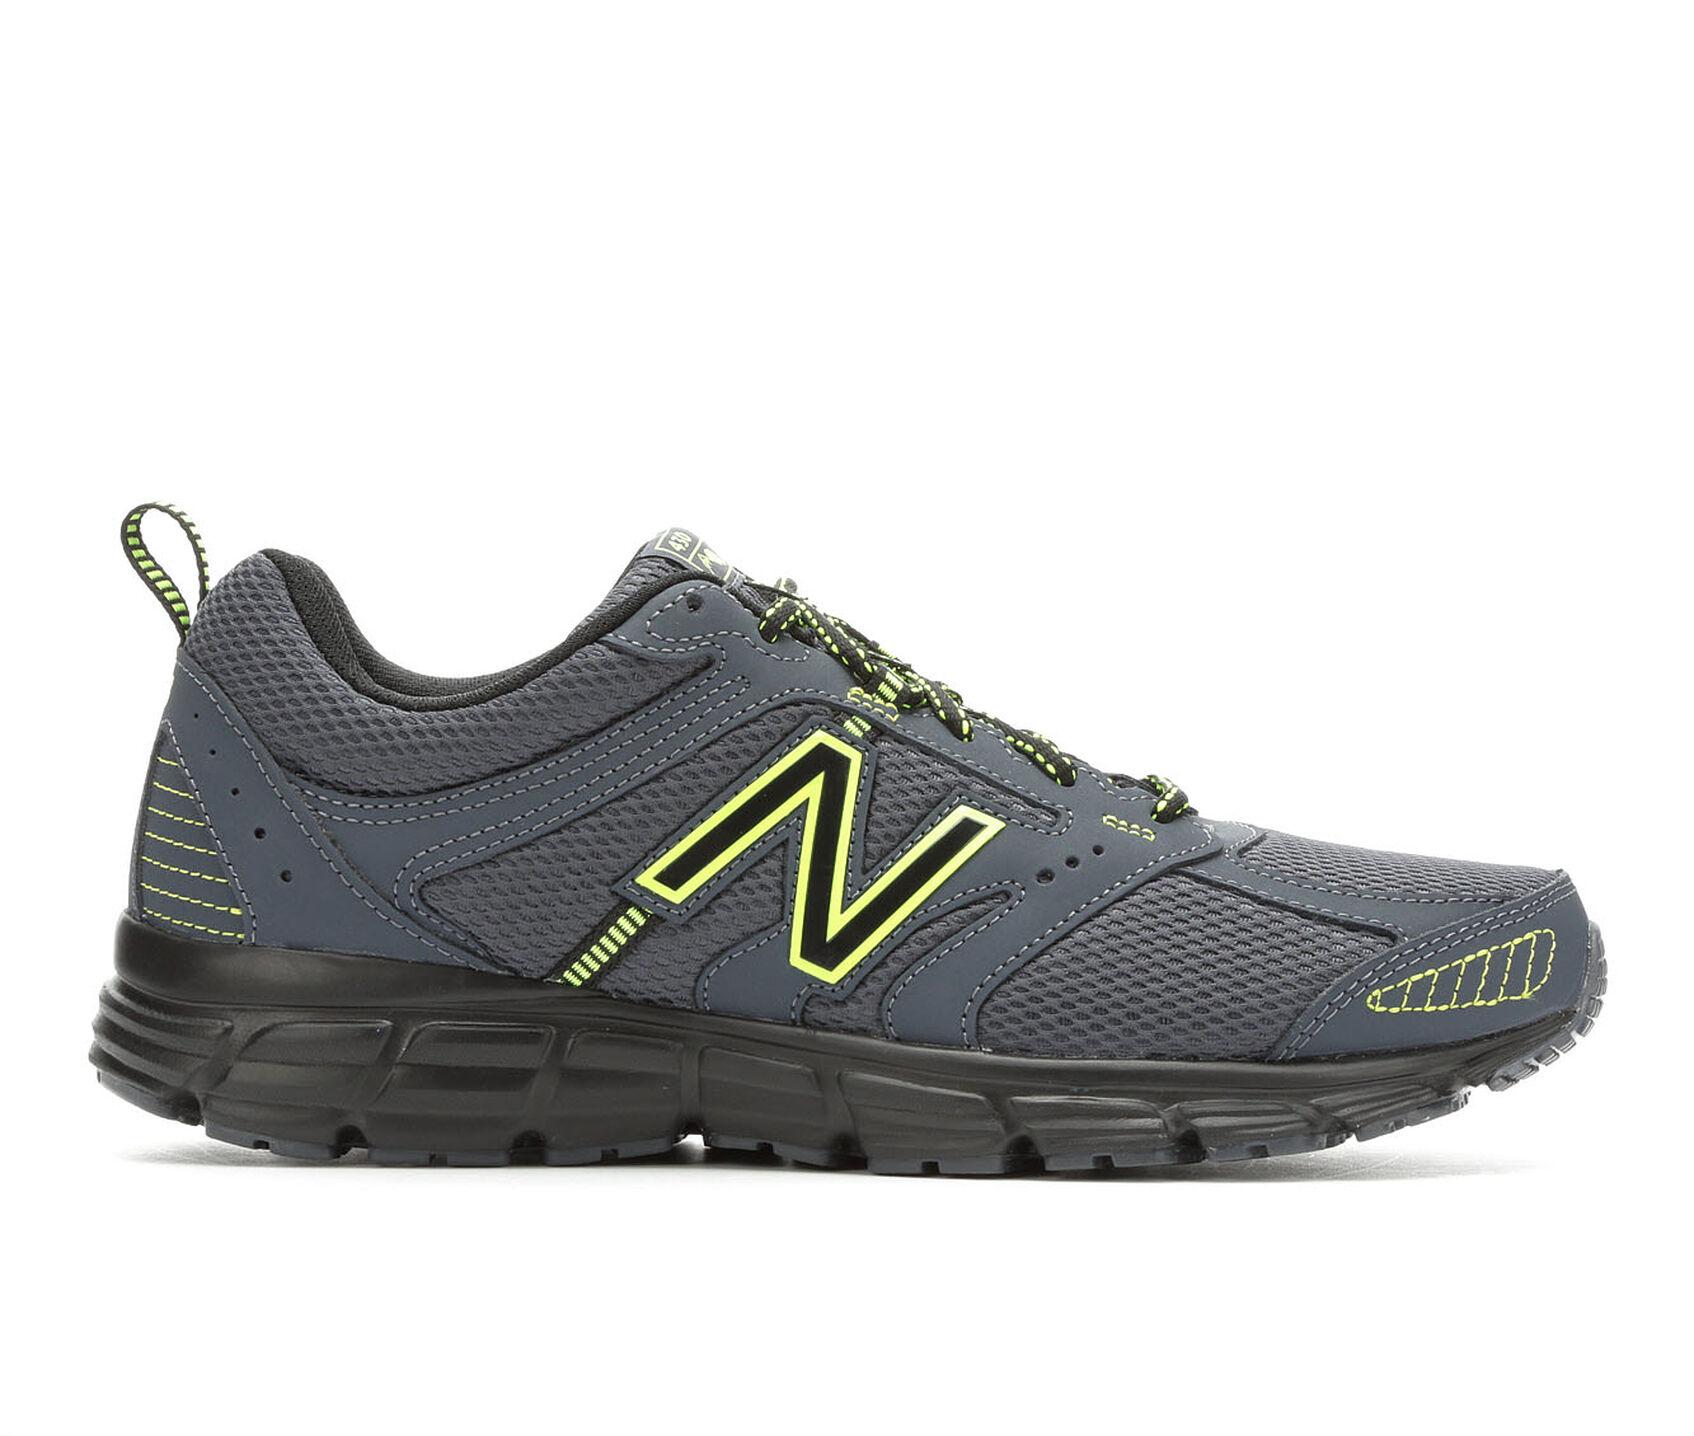 b748199a2 Men's New Balance M430LT1 Running Shoes | Shoe Carnival